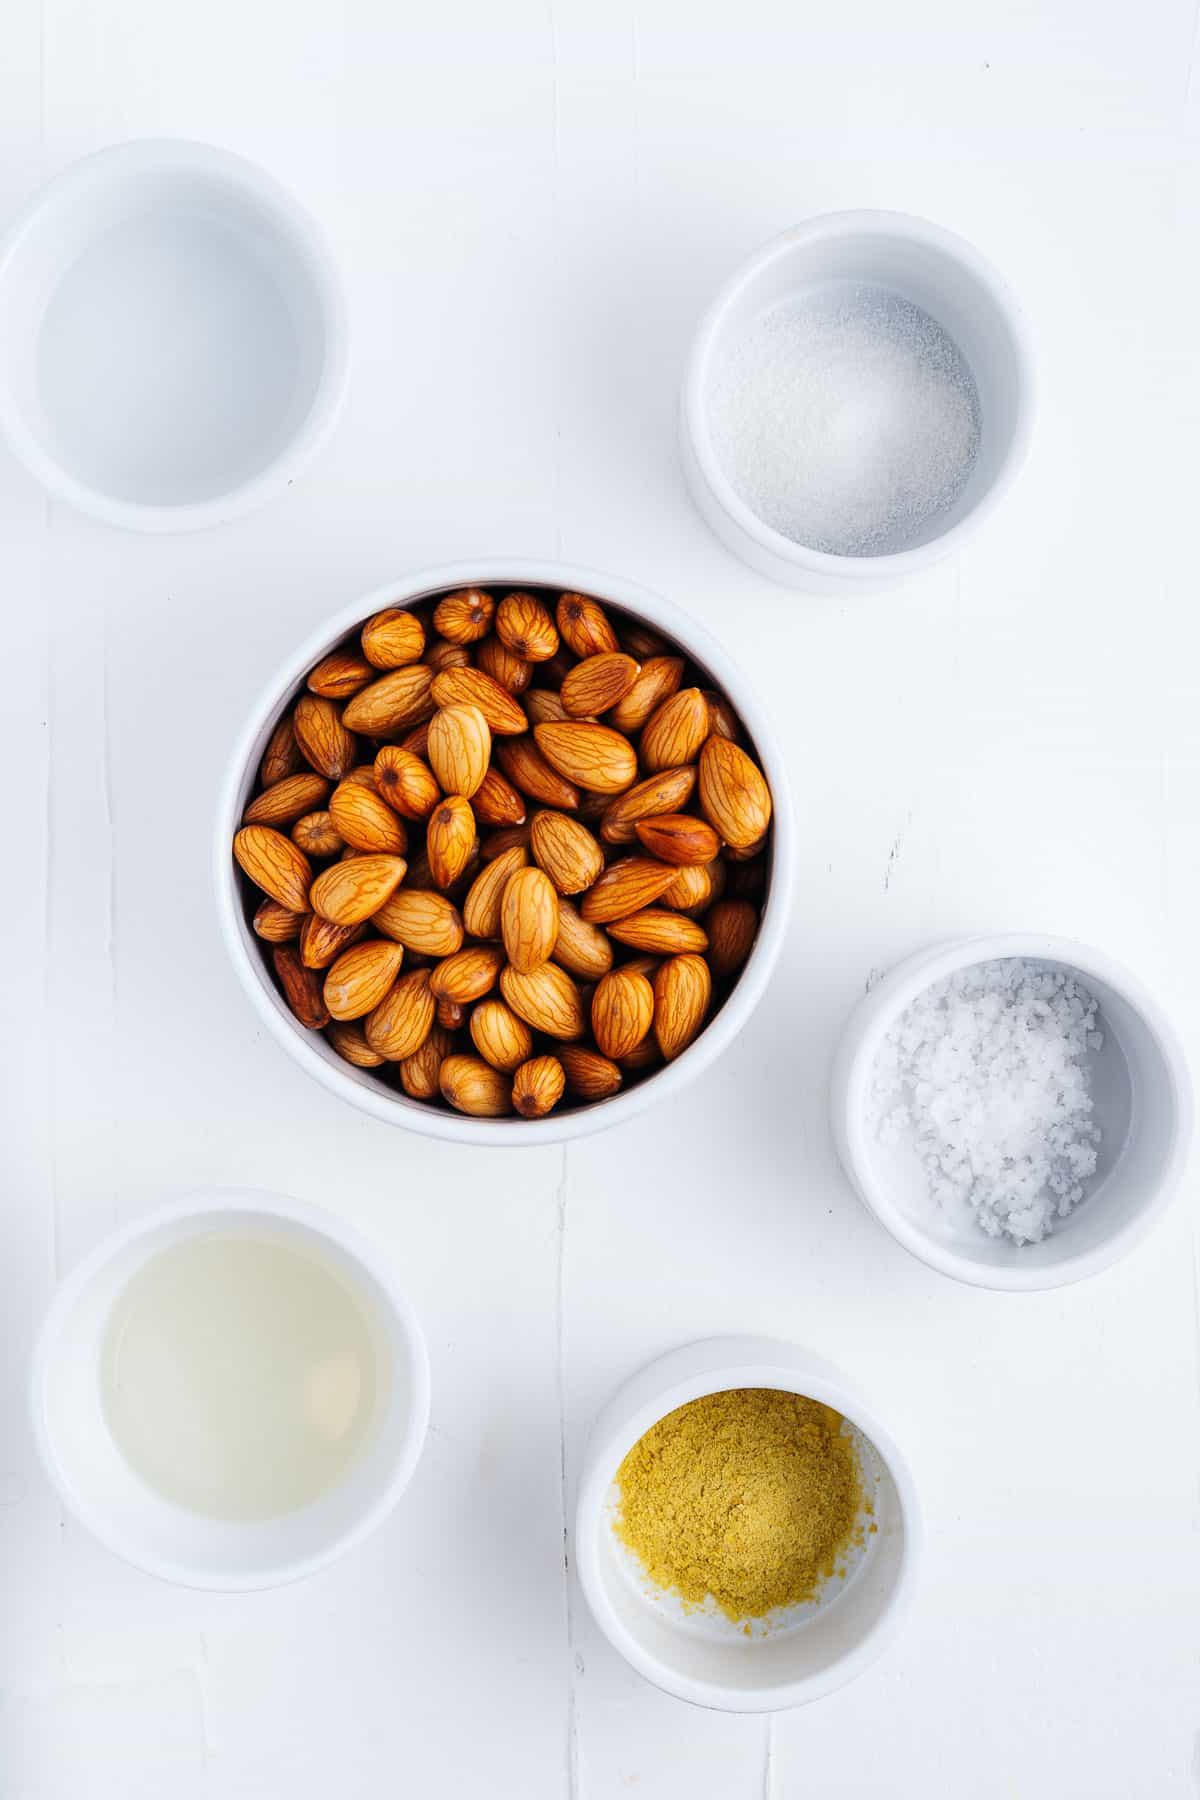 Almonds, Nutritional Yeast, Salt, Vinegar, Coconut Oil, and Agar